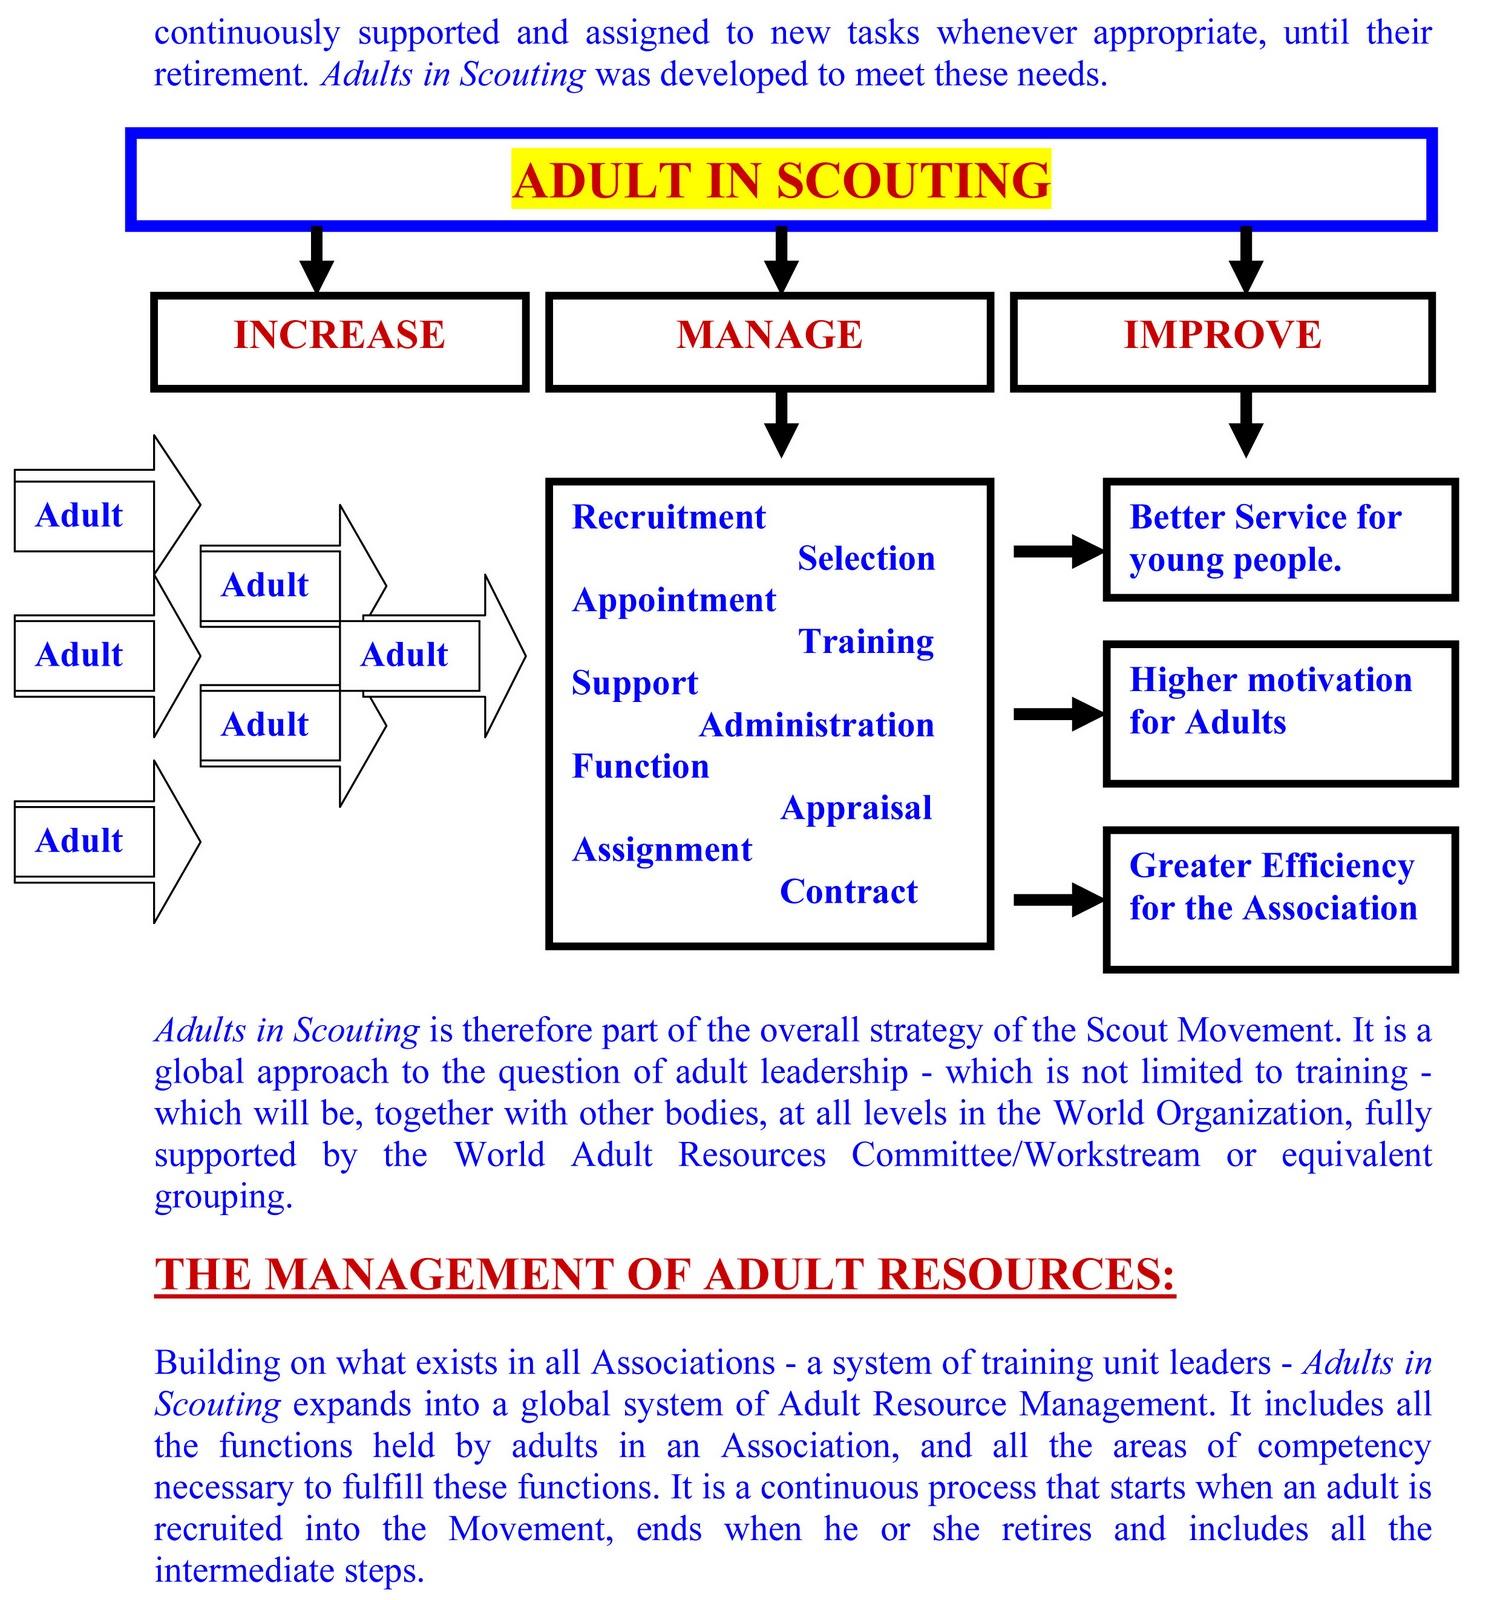 5 adult roles